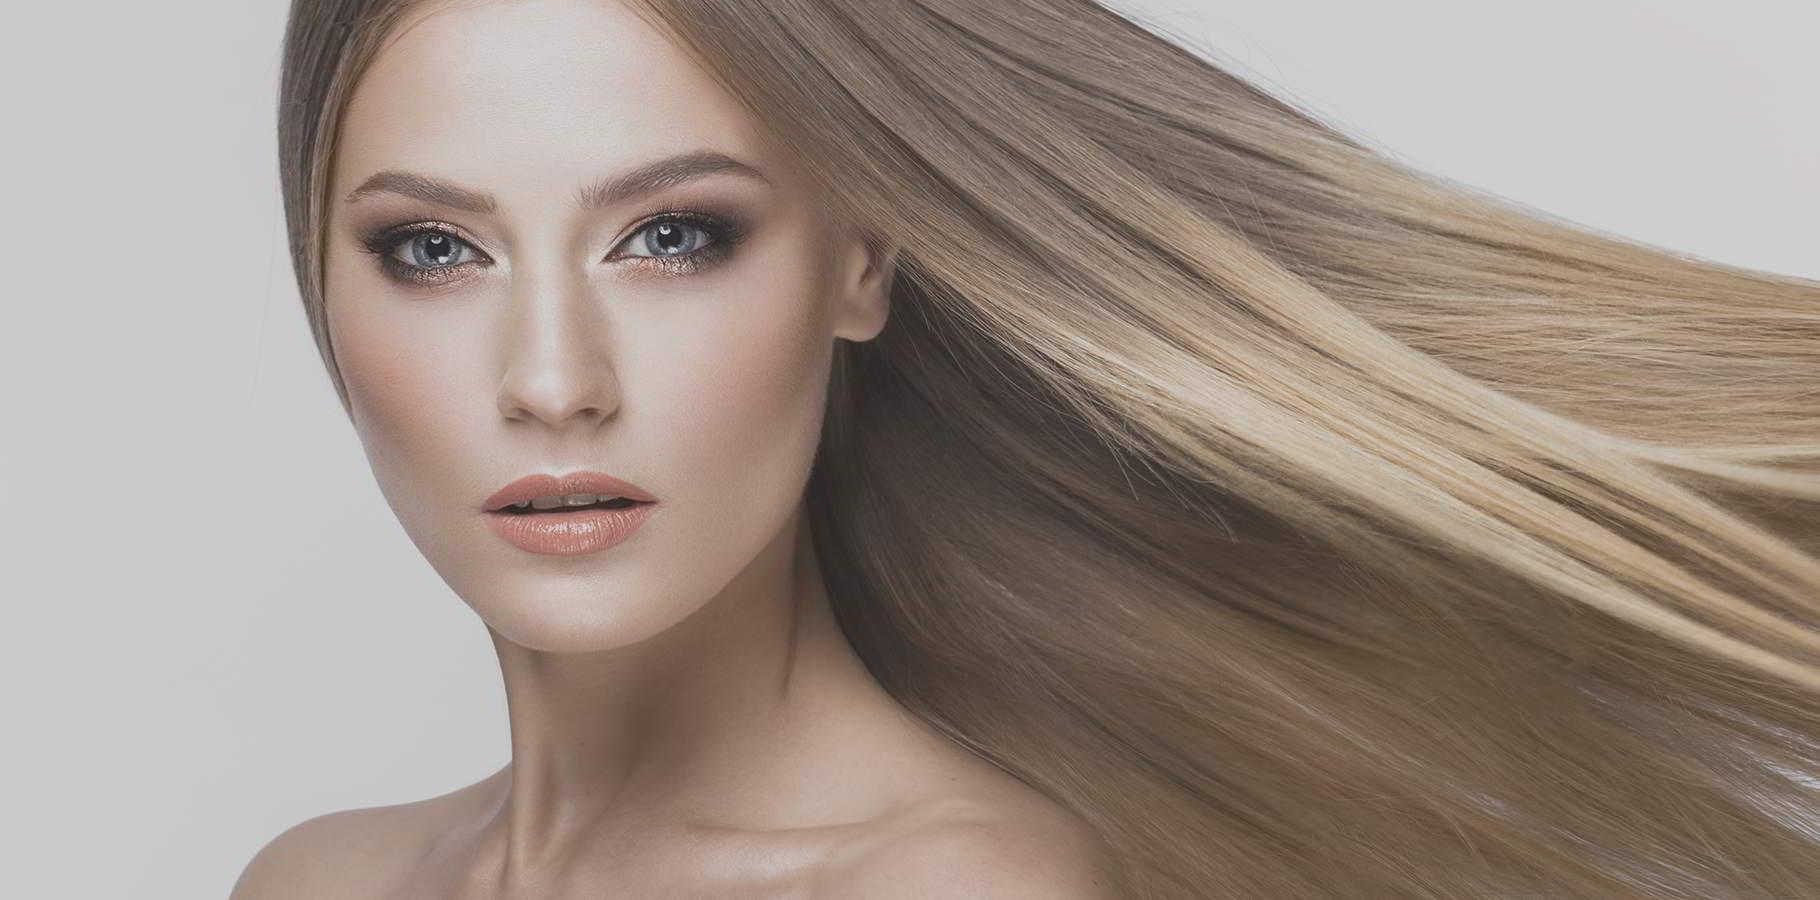 Tratamiento para pelo fino